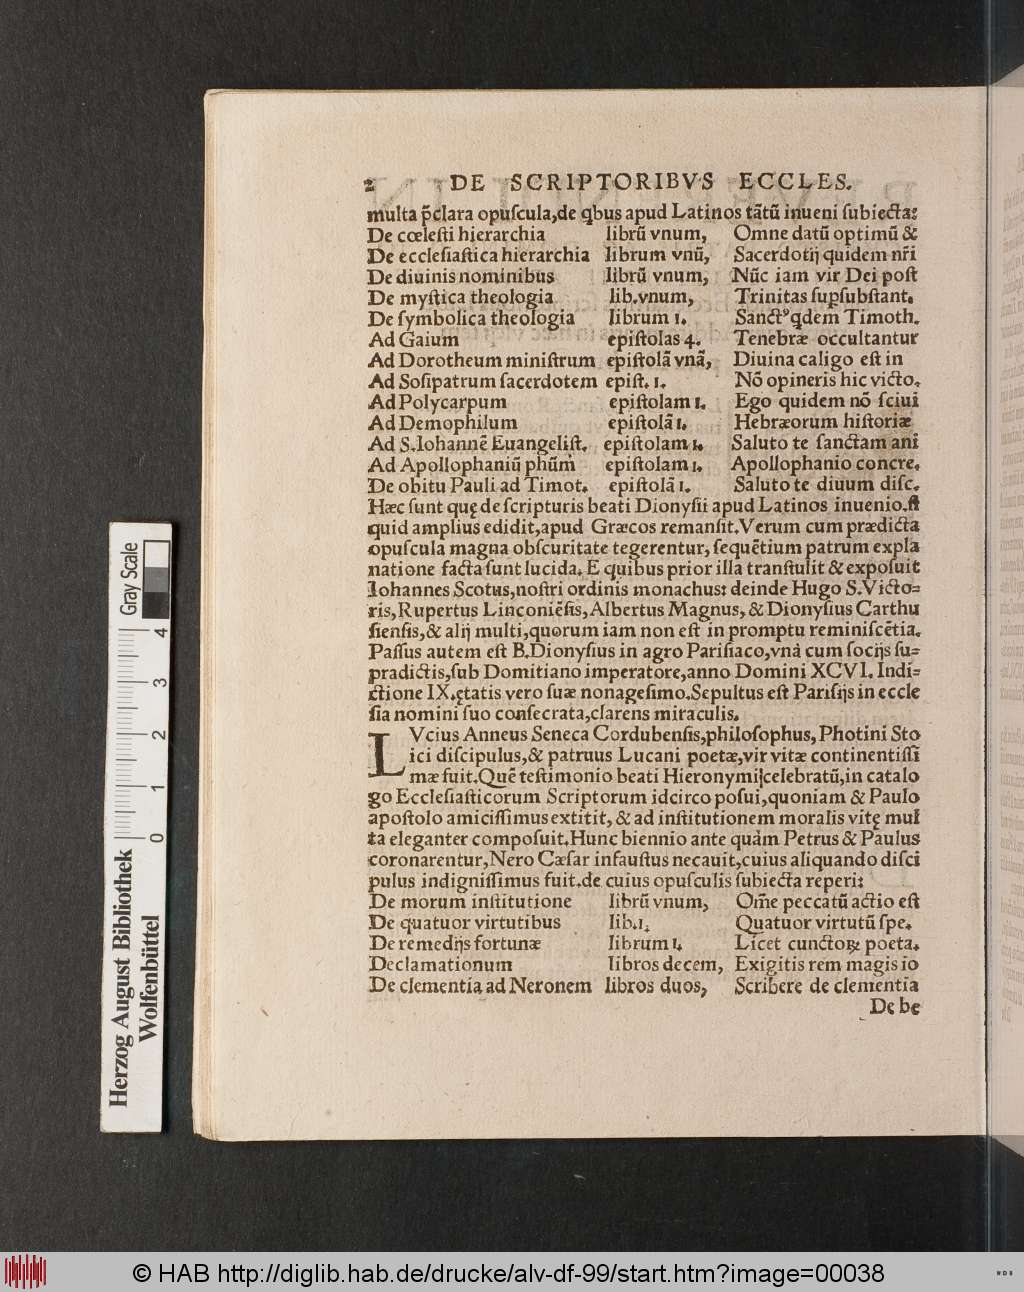 http://diglib.hab.de/drucke/alv-df-99/00038.jpg